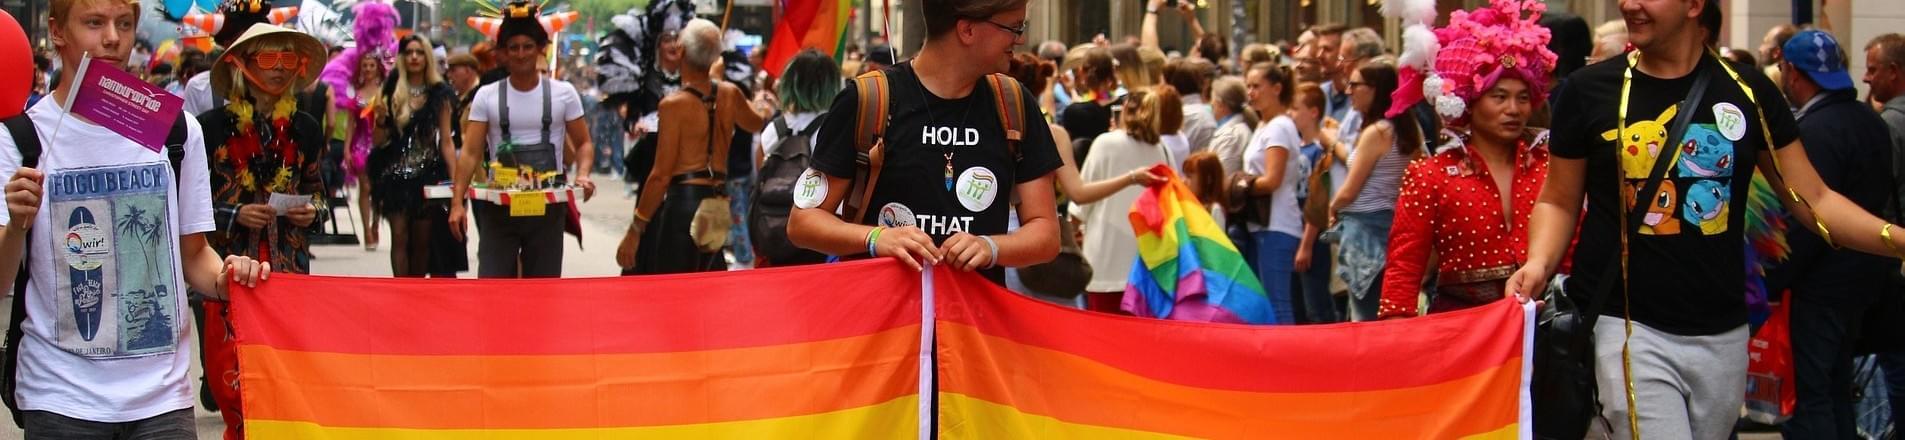 British universities becoming more gay-friendly